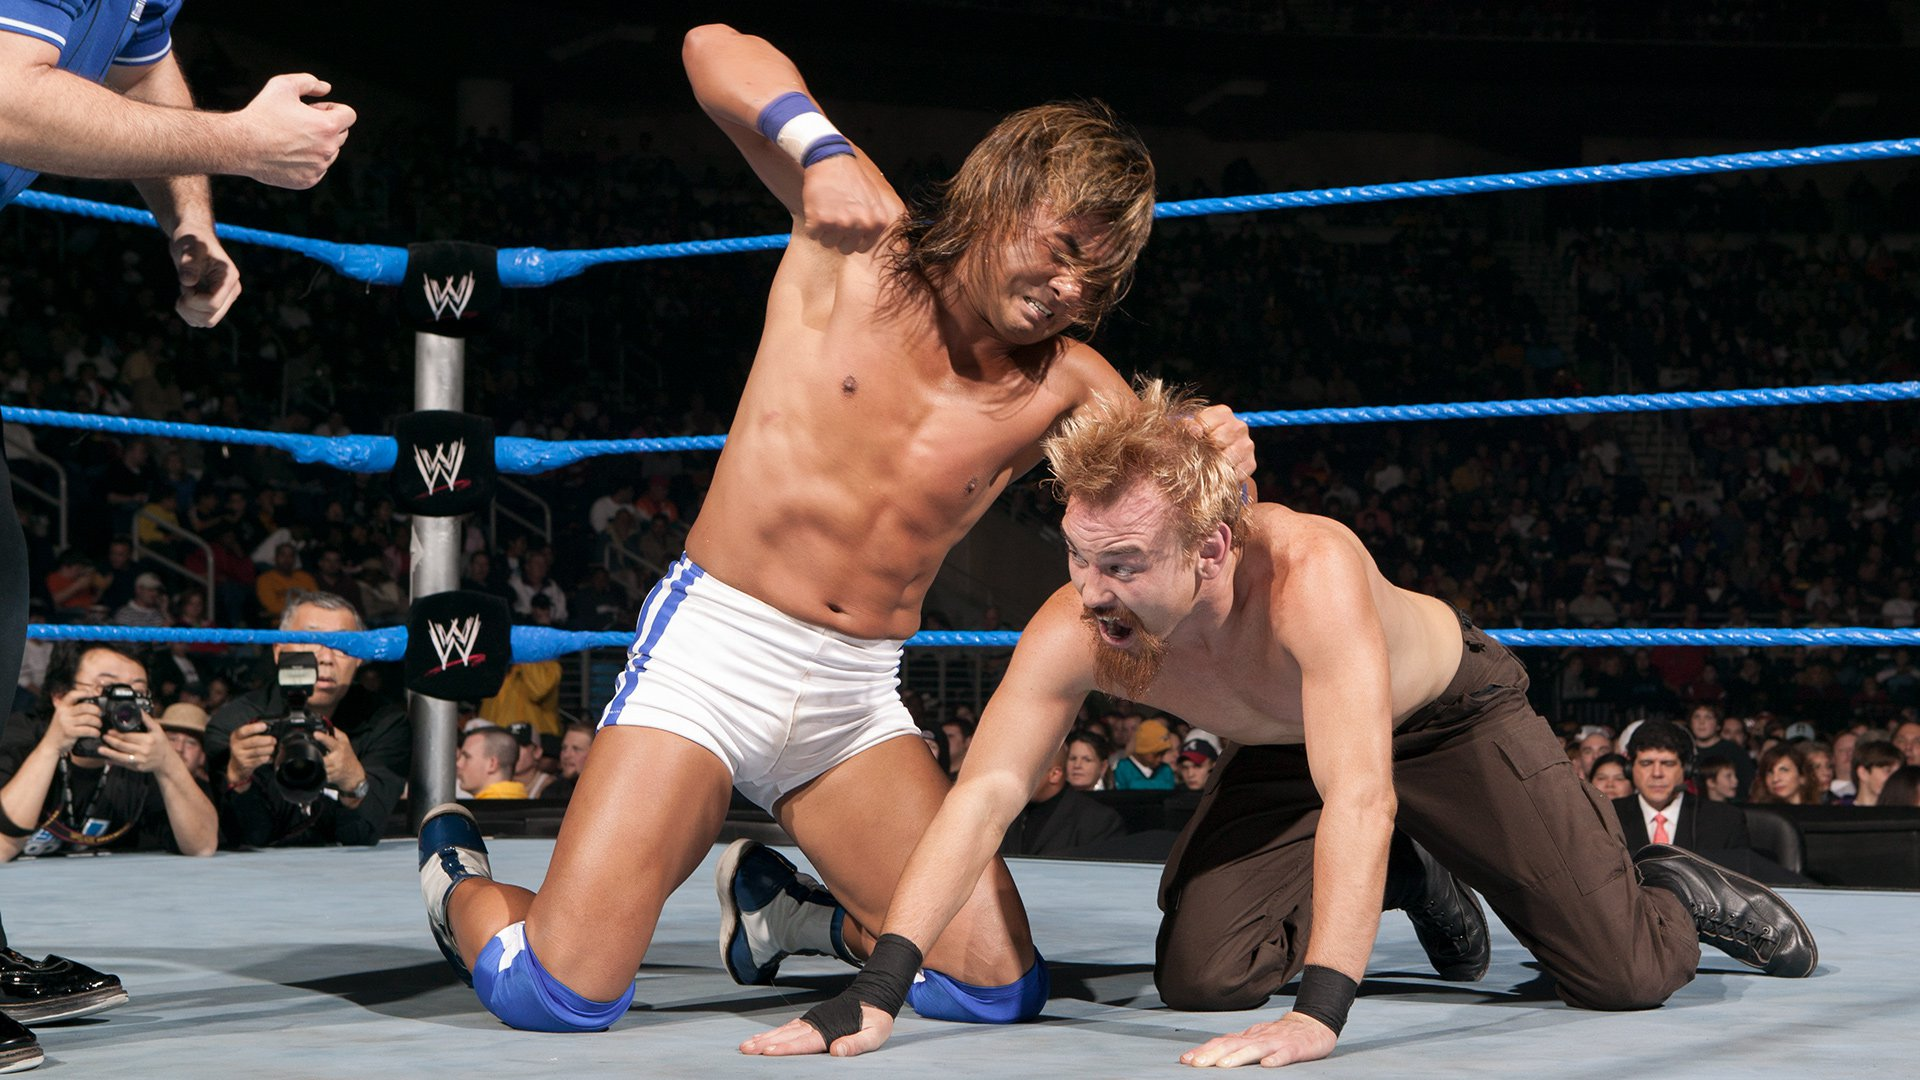 Image result for WWE armageddon 2004 Spike Dudley vs Funaki